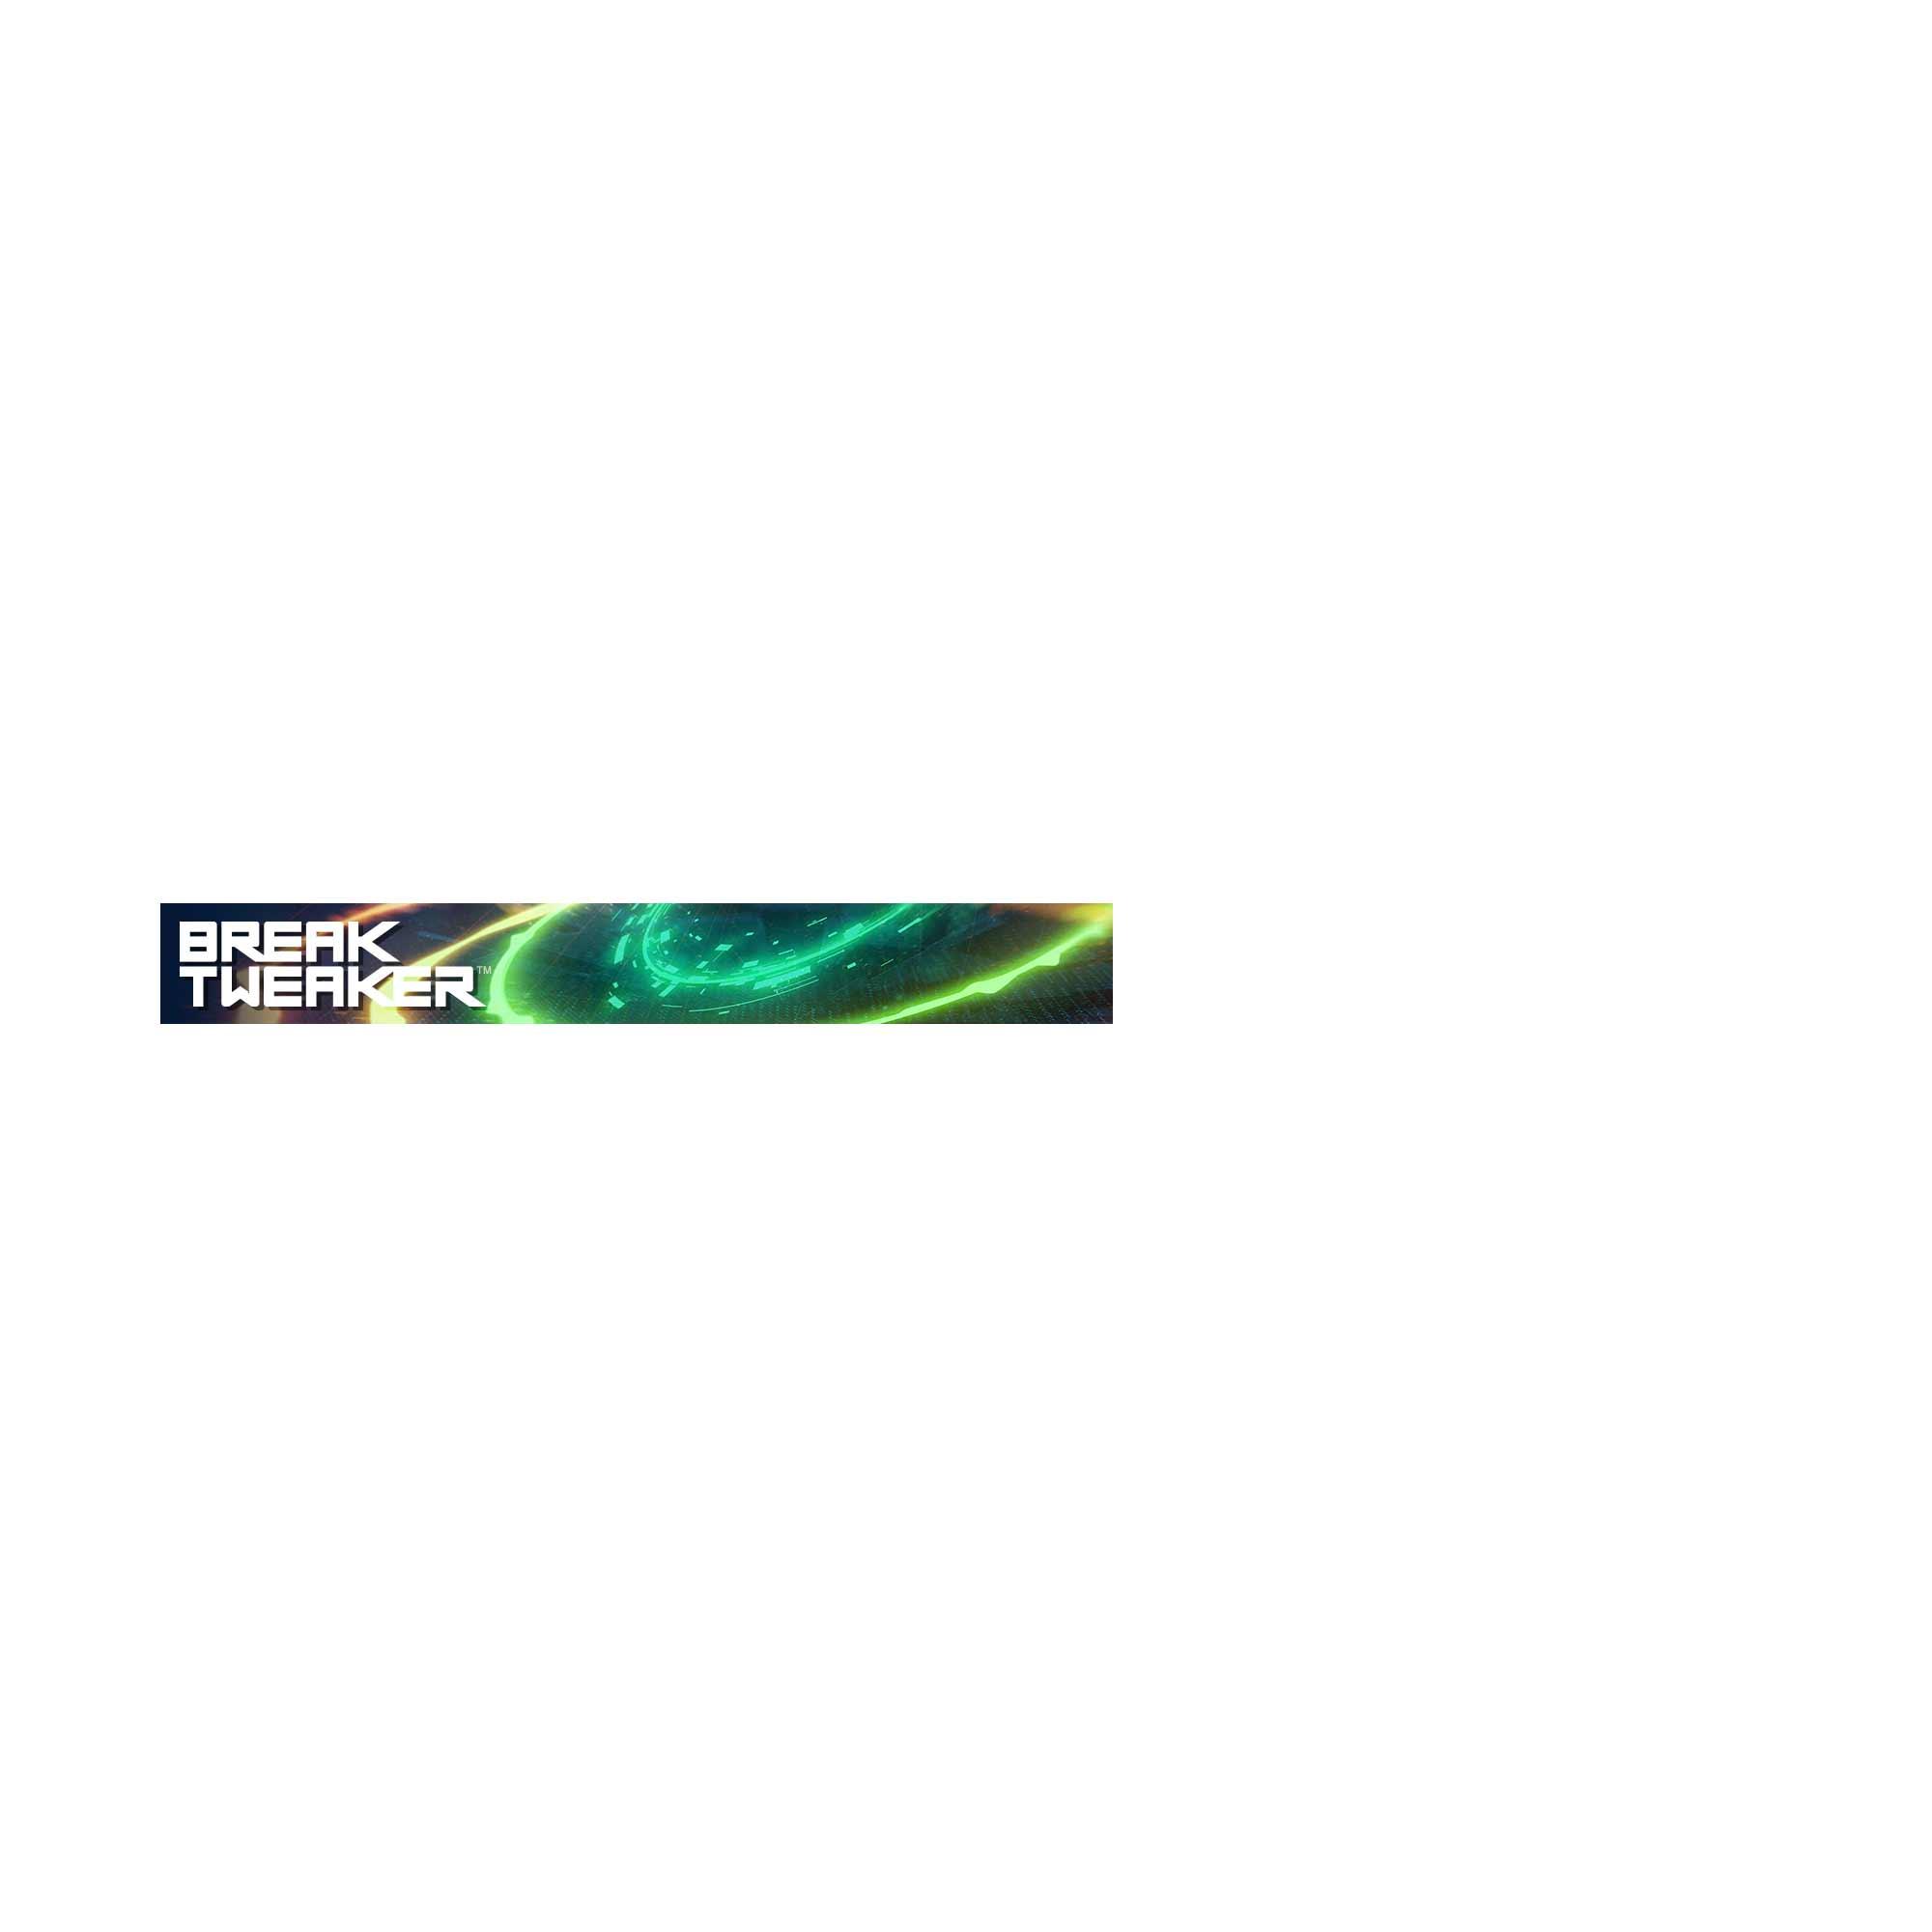 iZotope & BT Release BreakTweaker